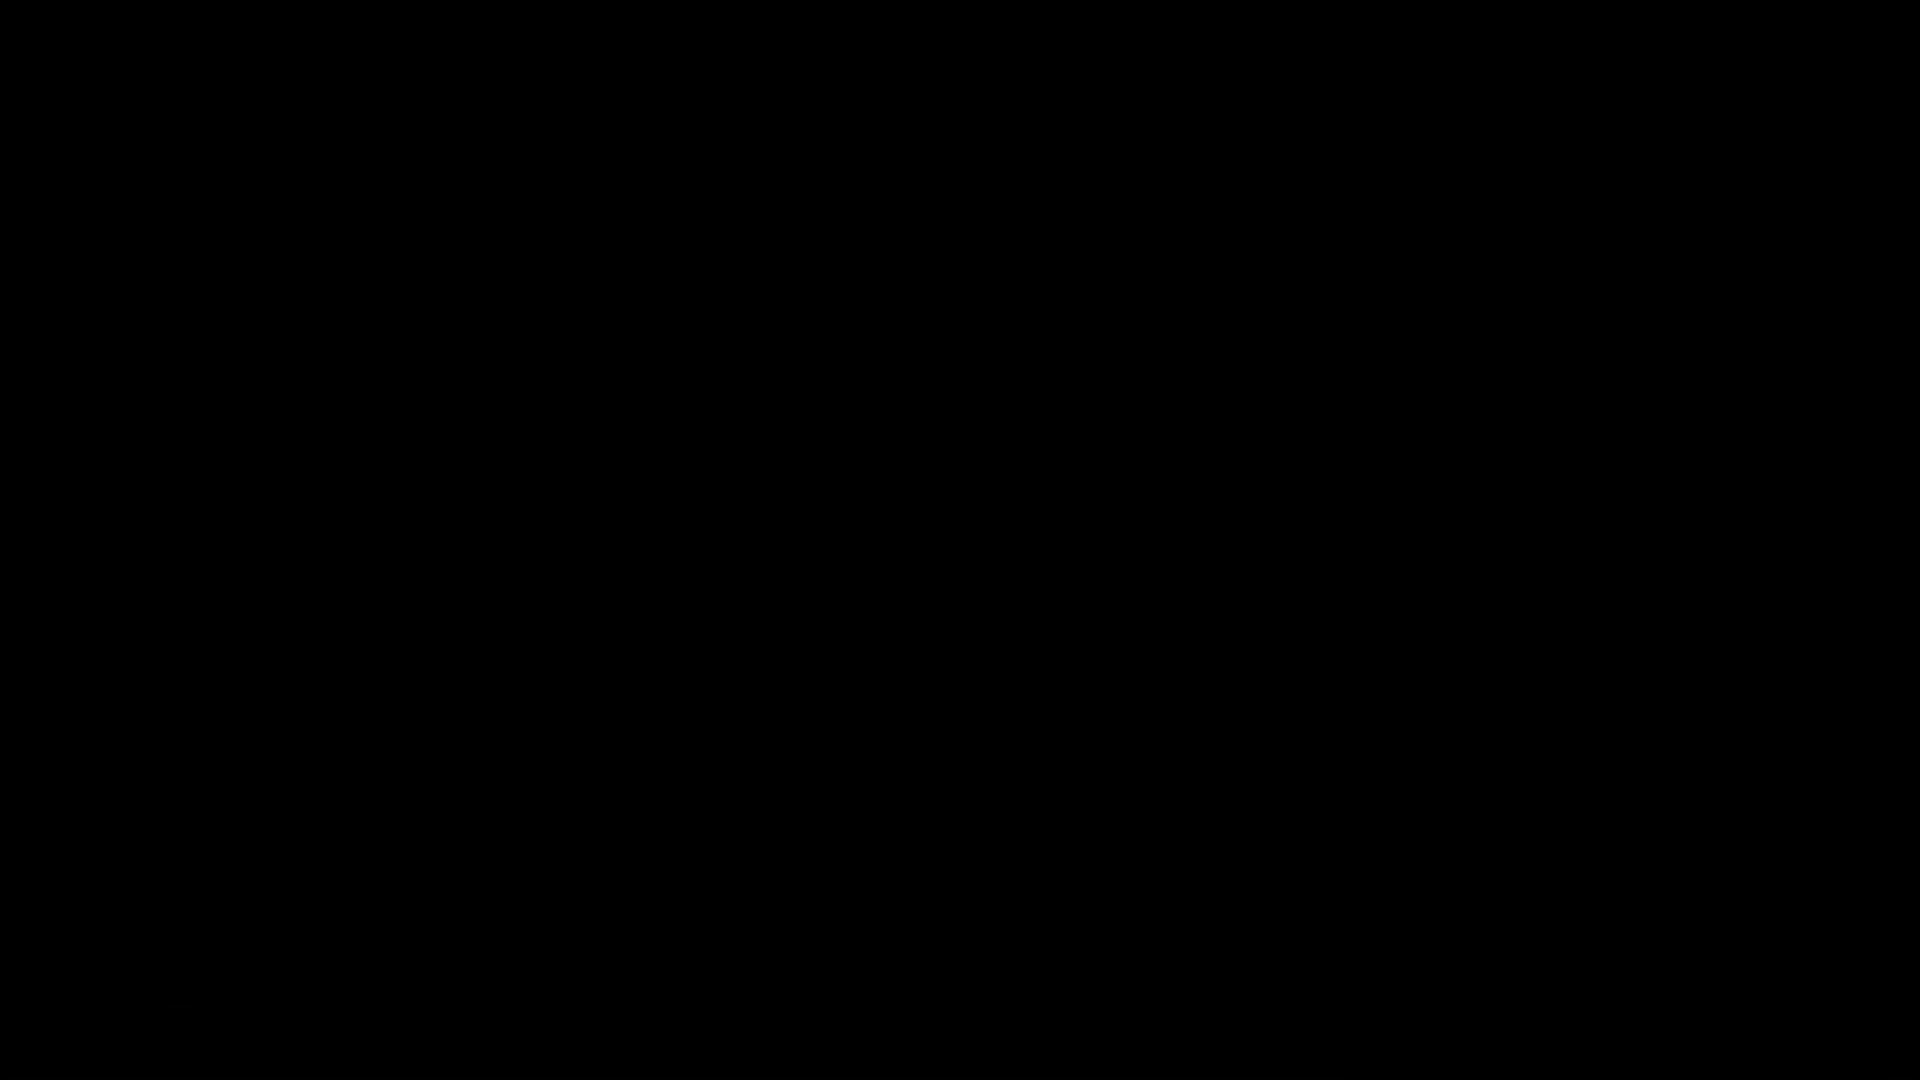 Vol.05 花の女子大生 トイレ恥態 進化系マルチアングル!! 丸見え AV無料動画キャプチャ 101枚 19